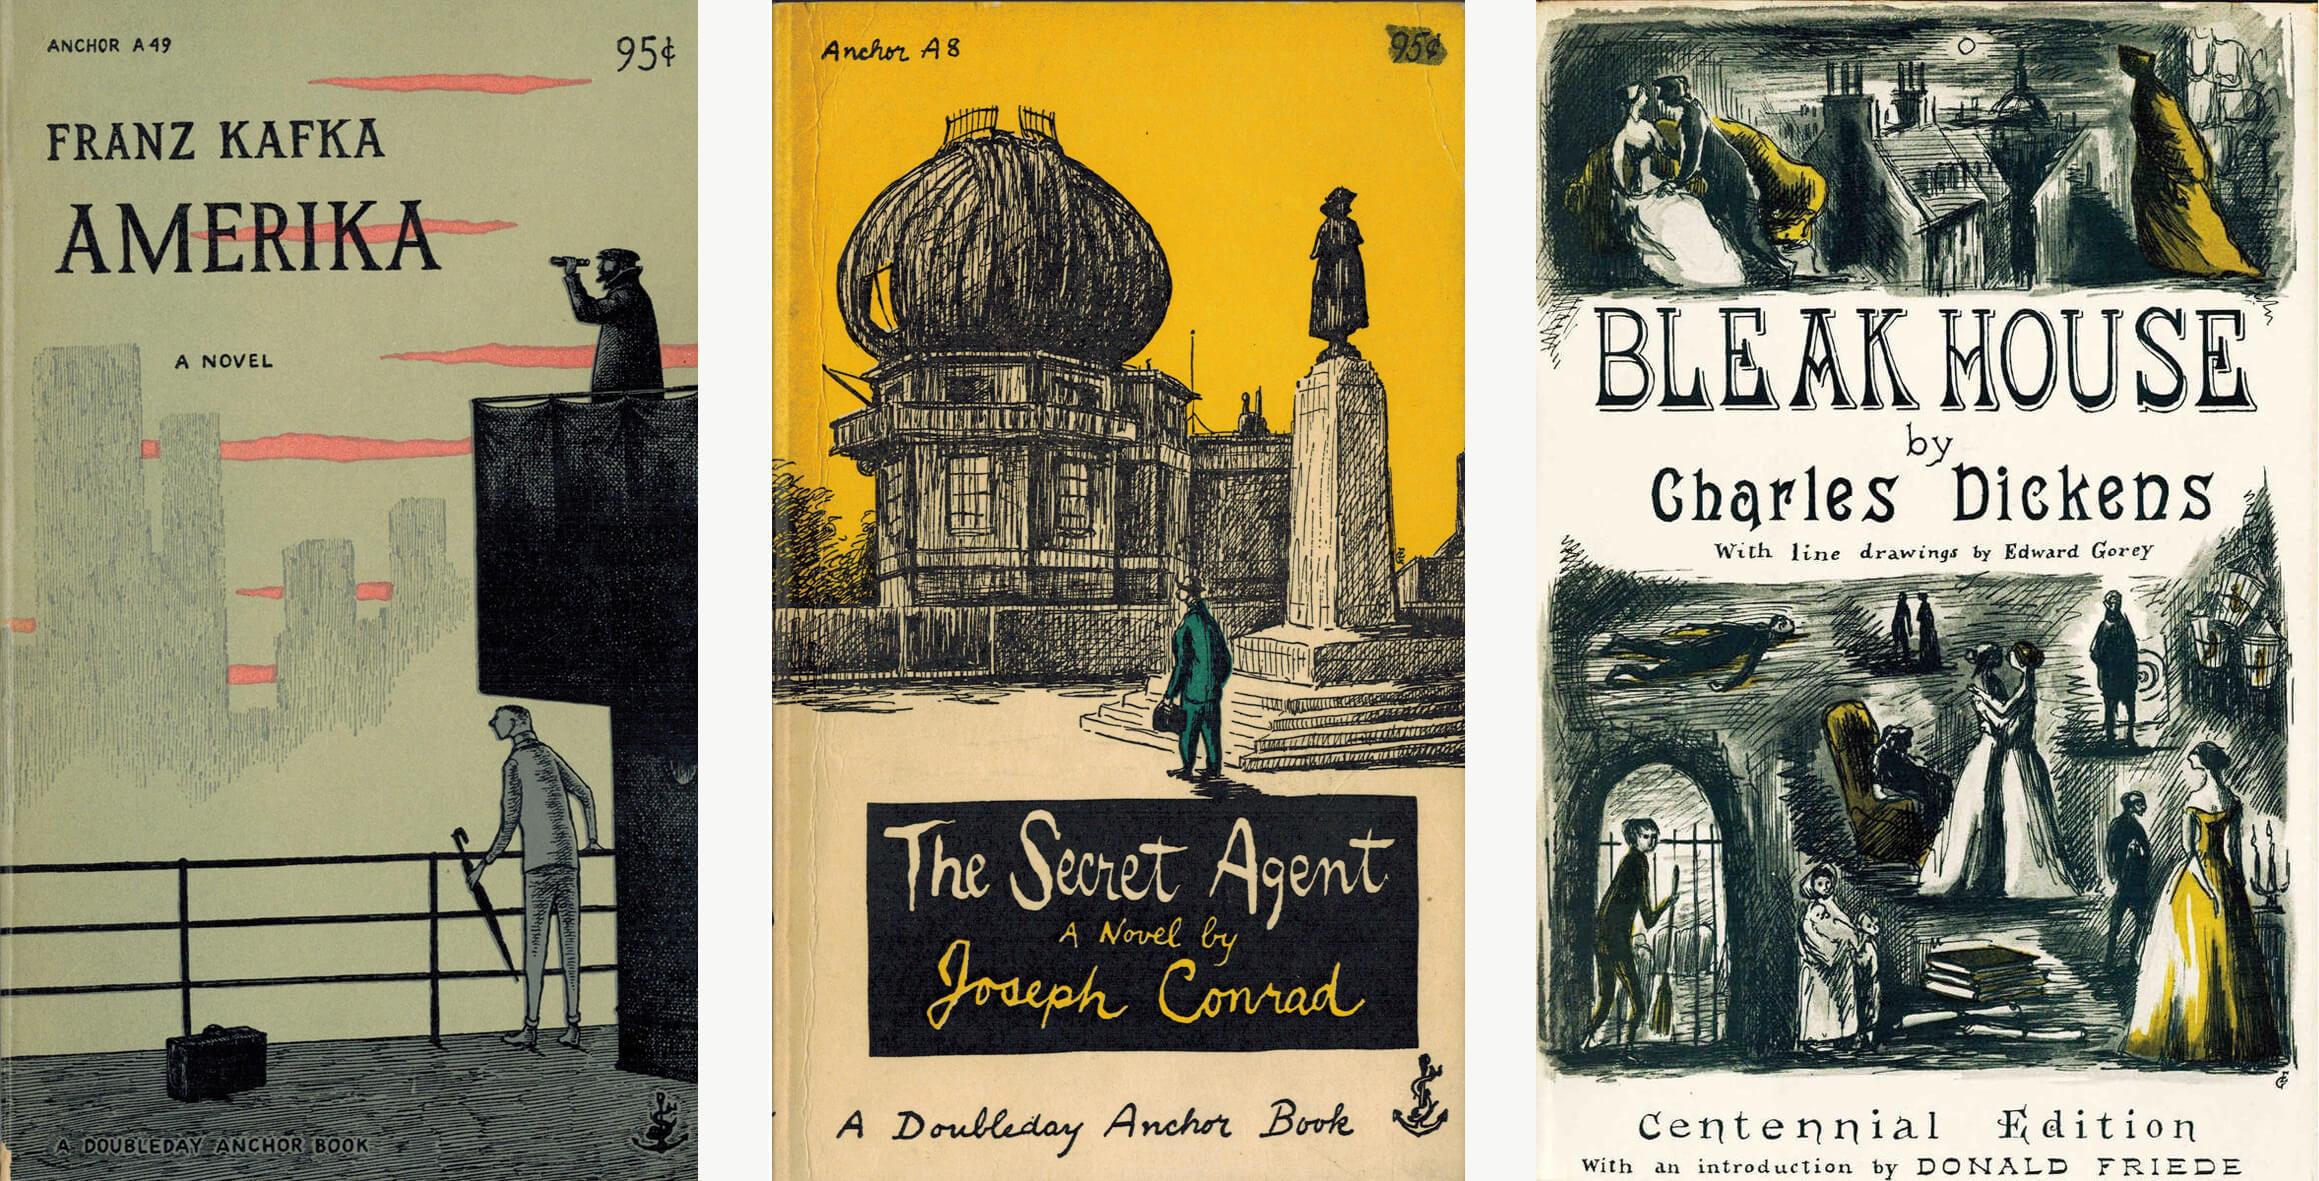 EdwardGorey-Illustration-BookCover-1953-55.jpg